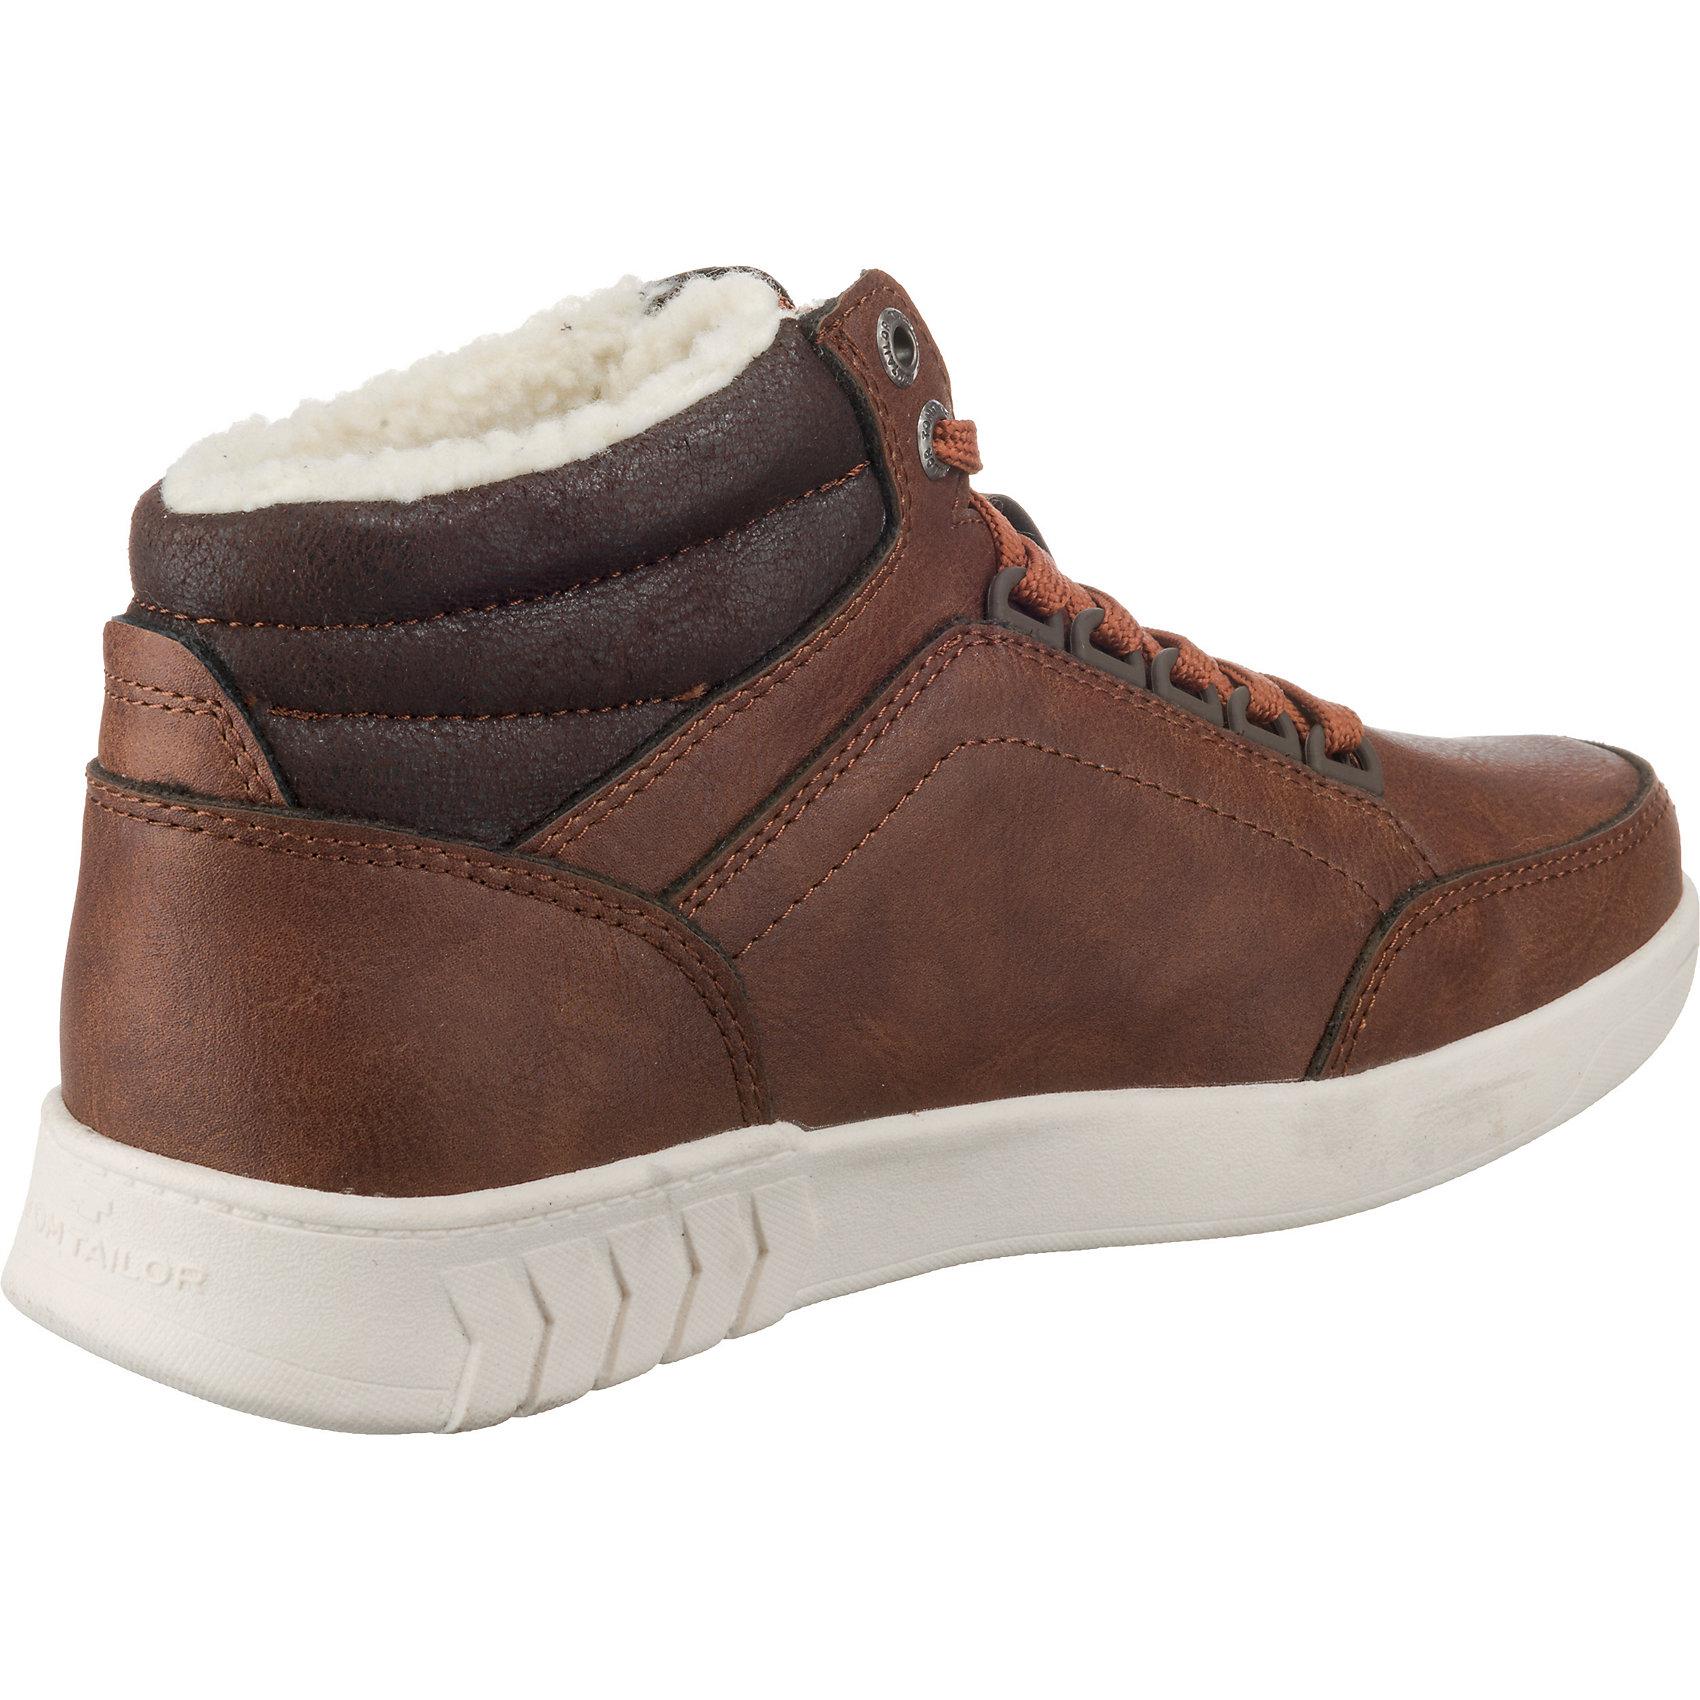 Neu Neu Neu TOM TAILOR Sneakers High 8834609 für Herren schwarz dunkelbraun 71b0f1